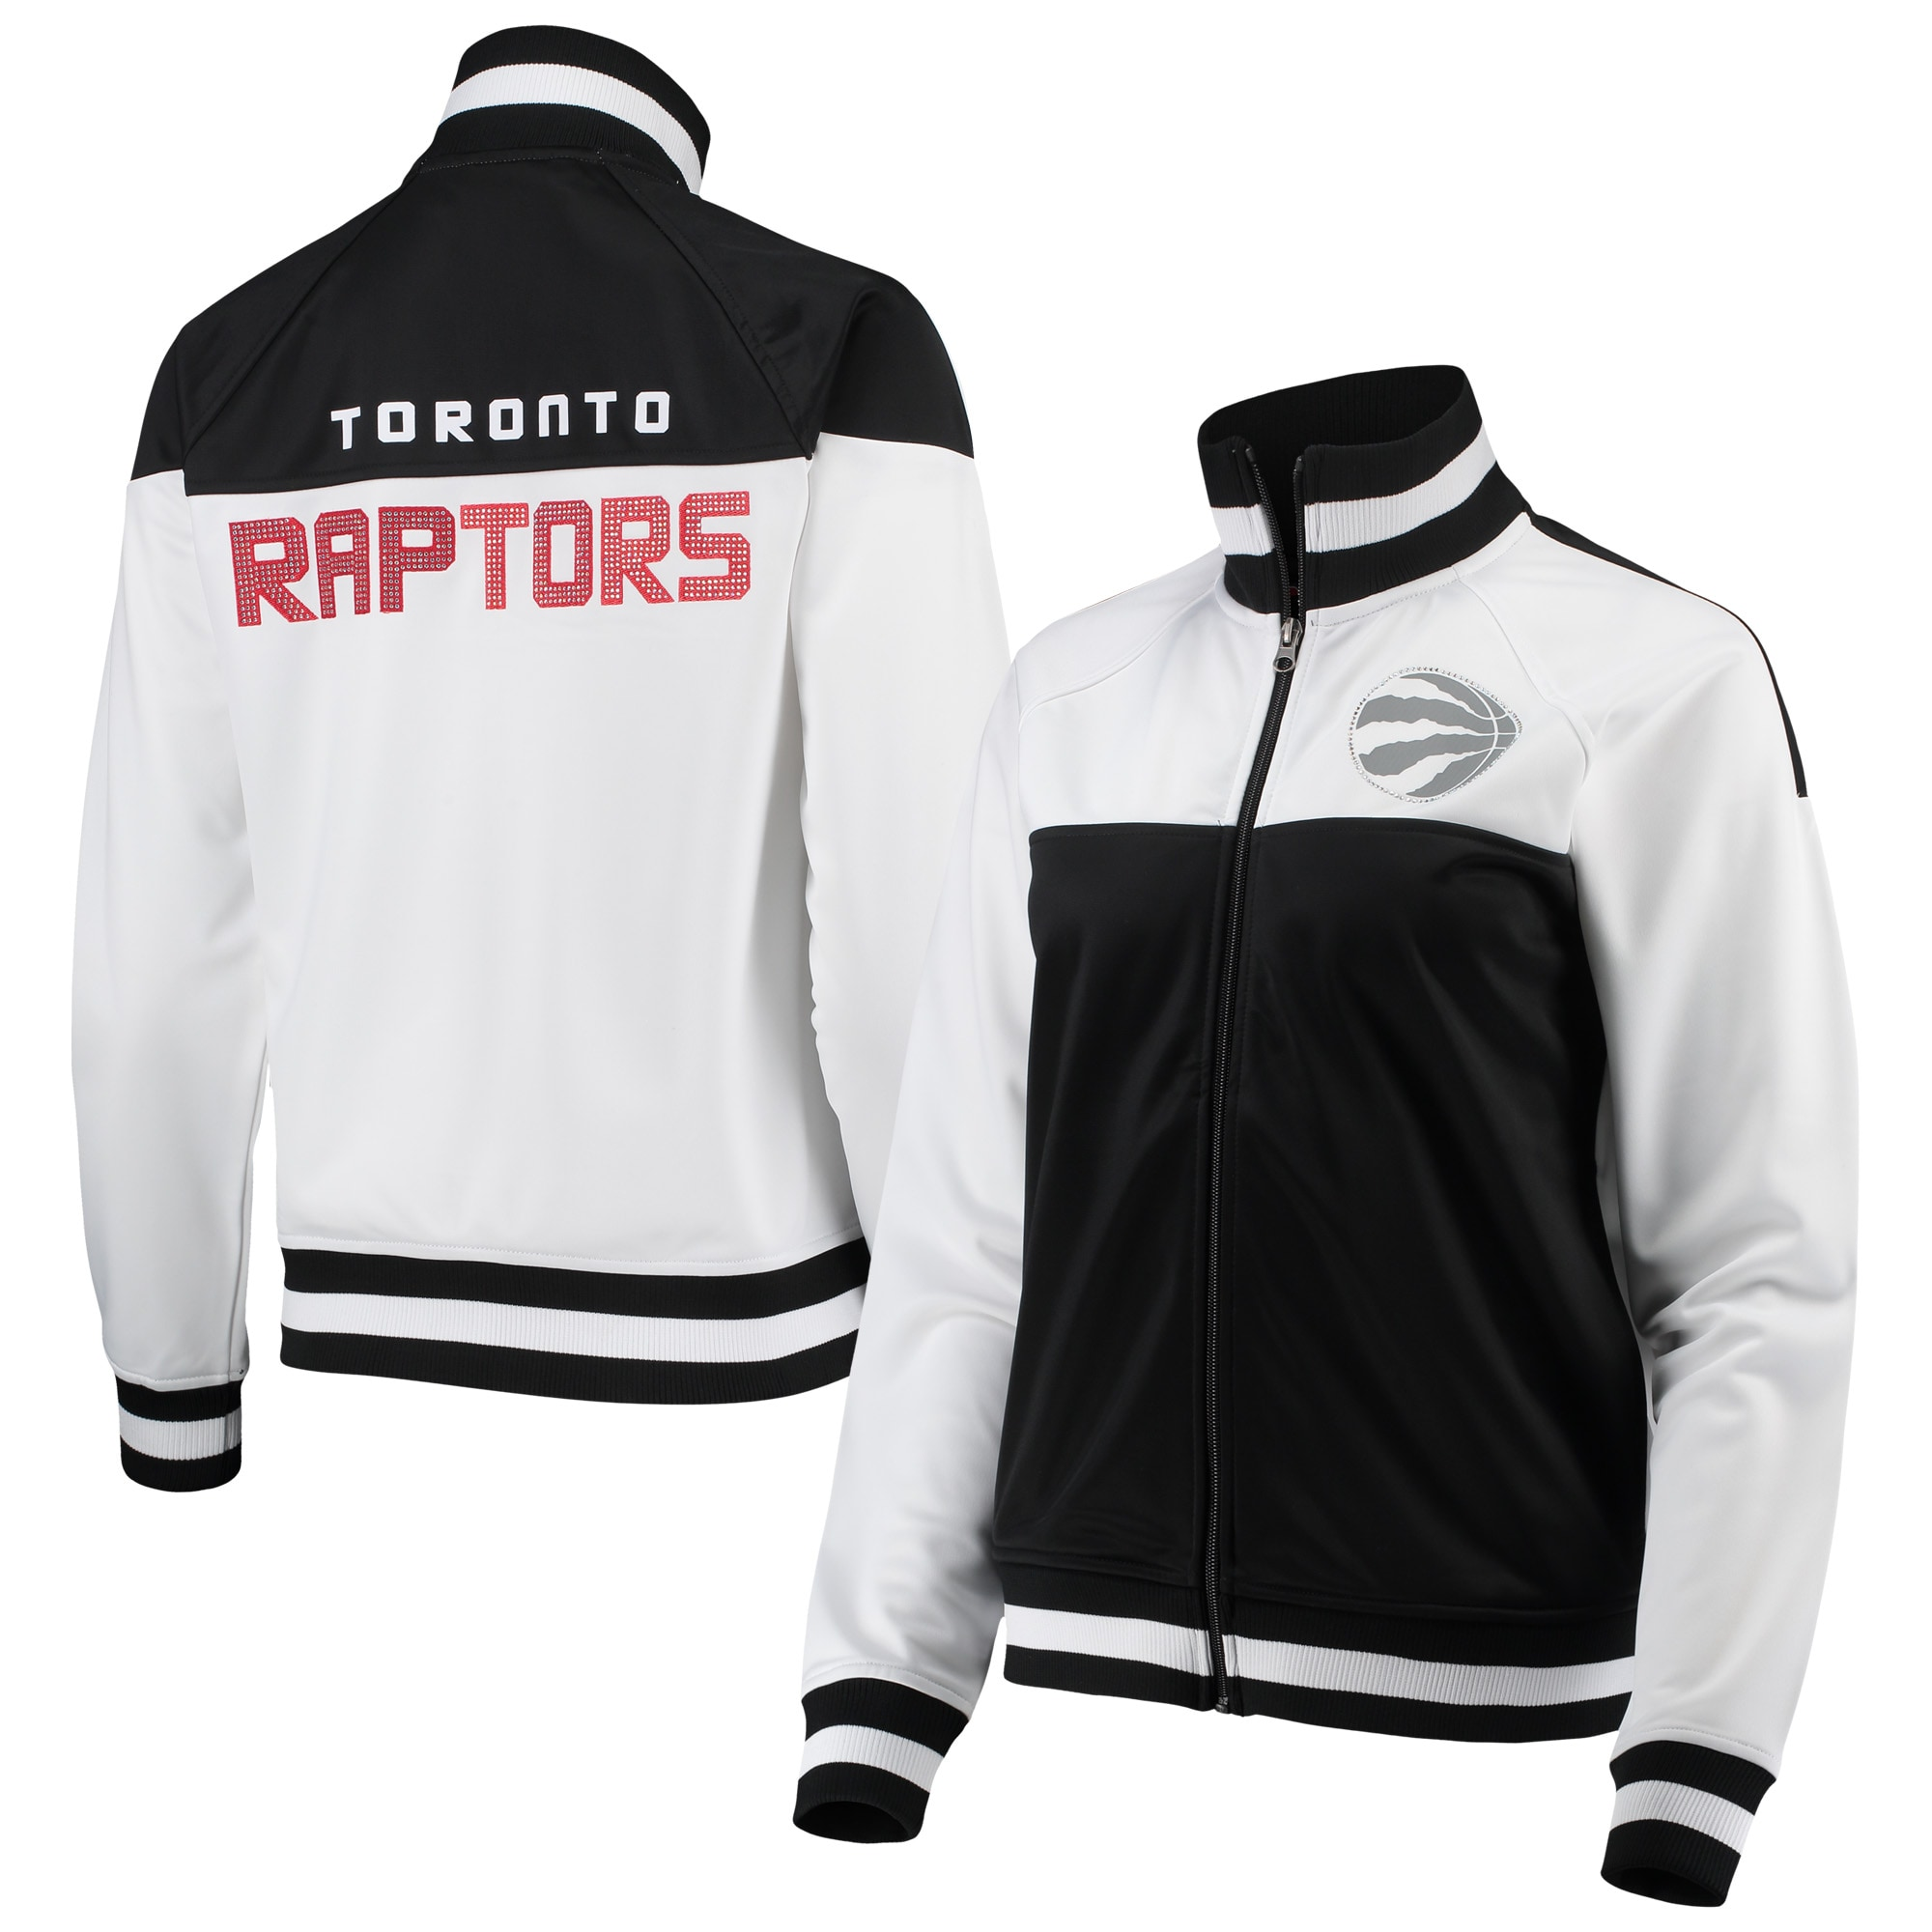 Toronto Raptors G-III 4Her by Carl Banks Women's Tip-Off Rhinestone Tricot Full-Zip Track Jacket - White/Black